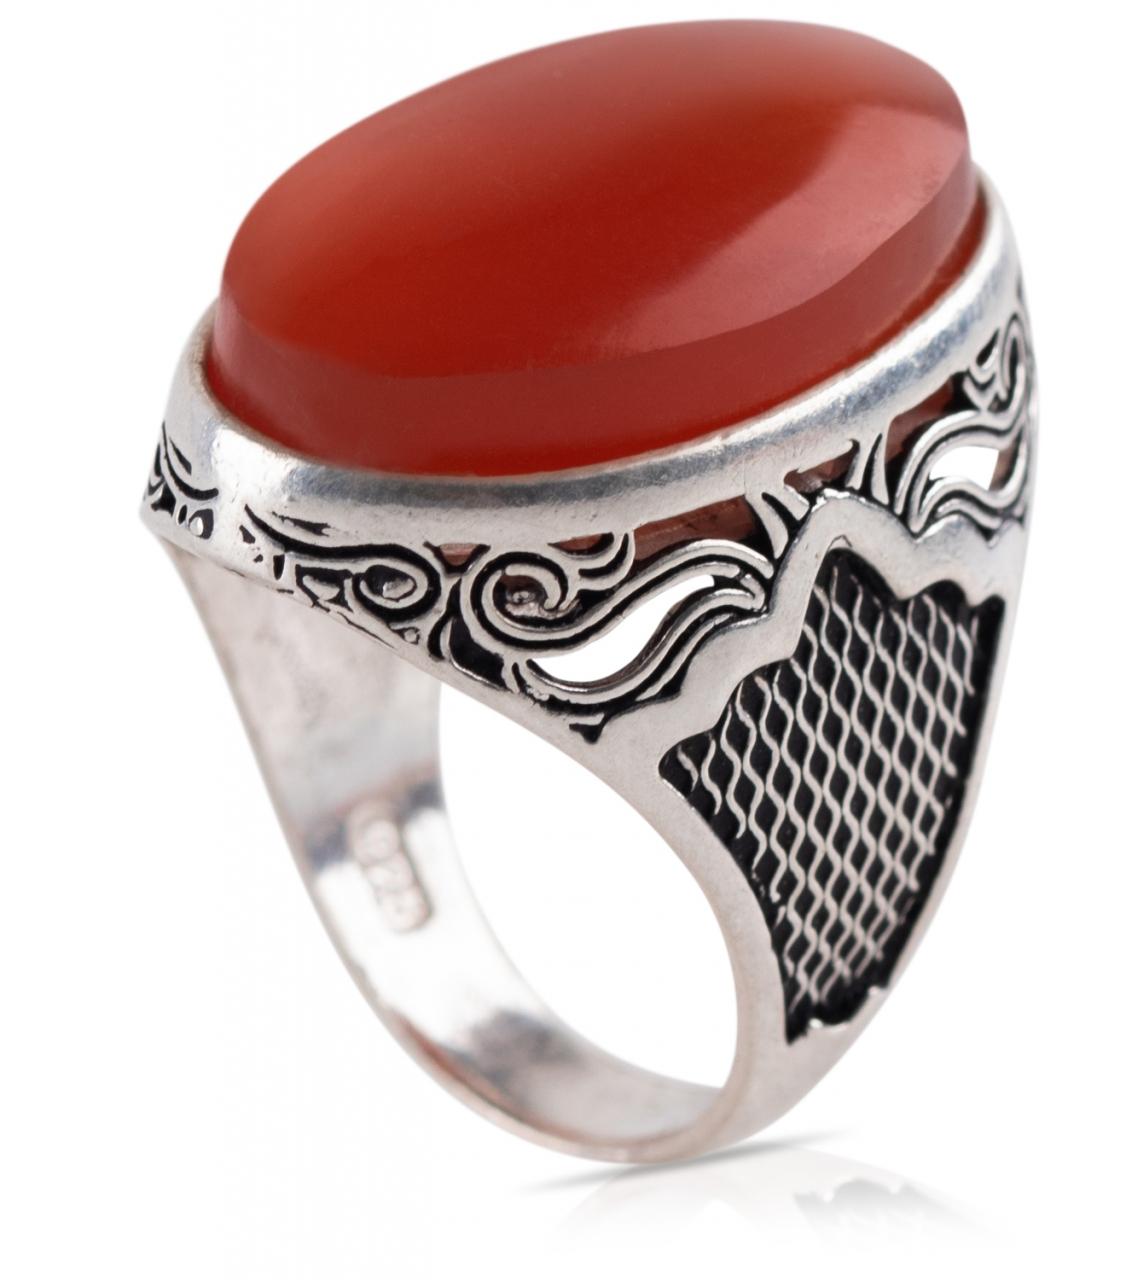 Herren Aqiq Rot - Silberring Fassung graviert - RE56